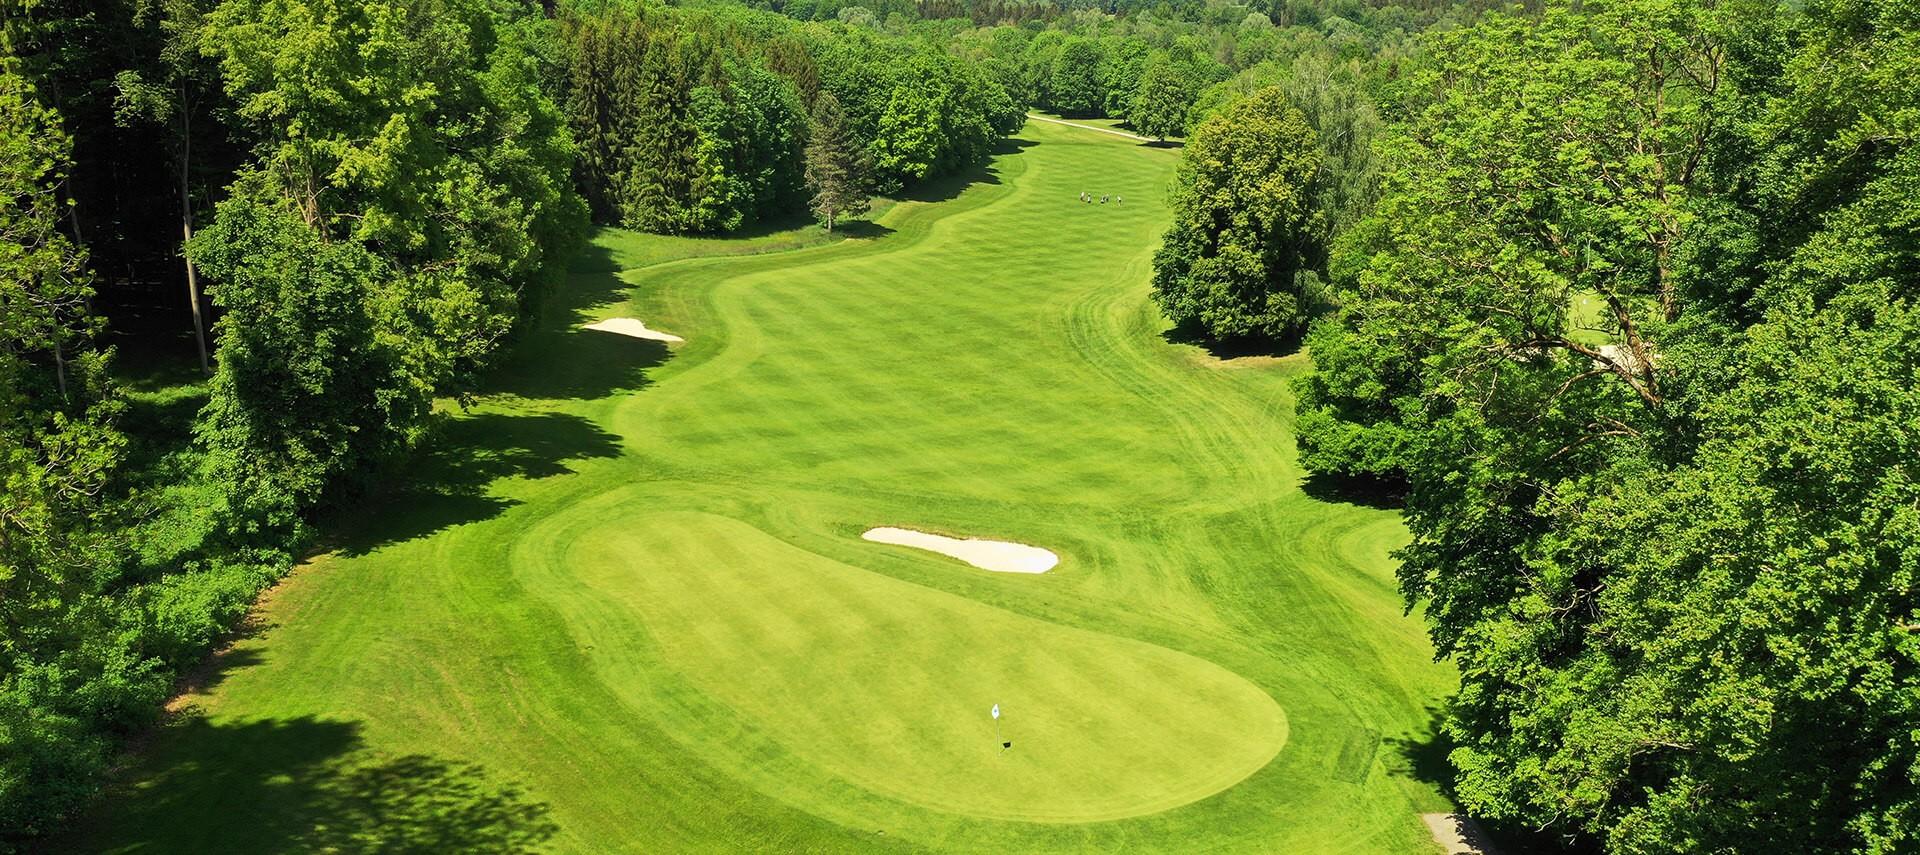 1 - GolfClub Schloss Klingenburg - OK - 2021-04